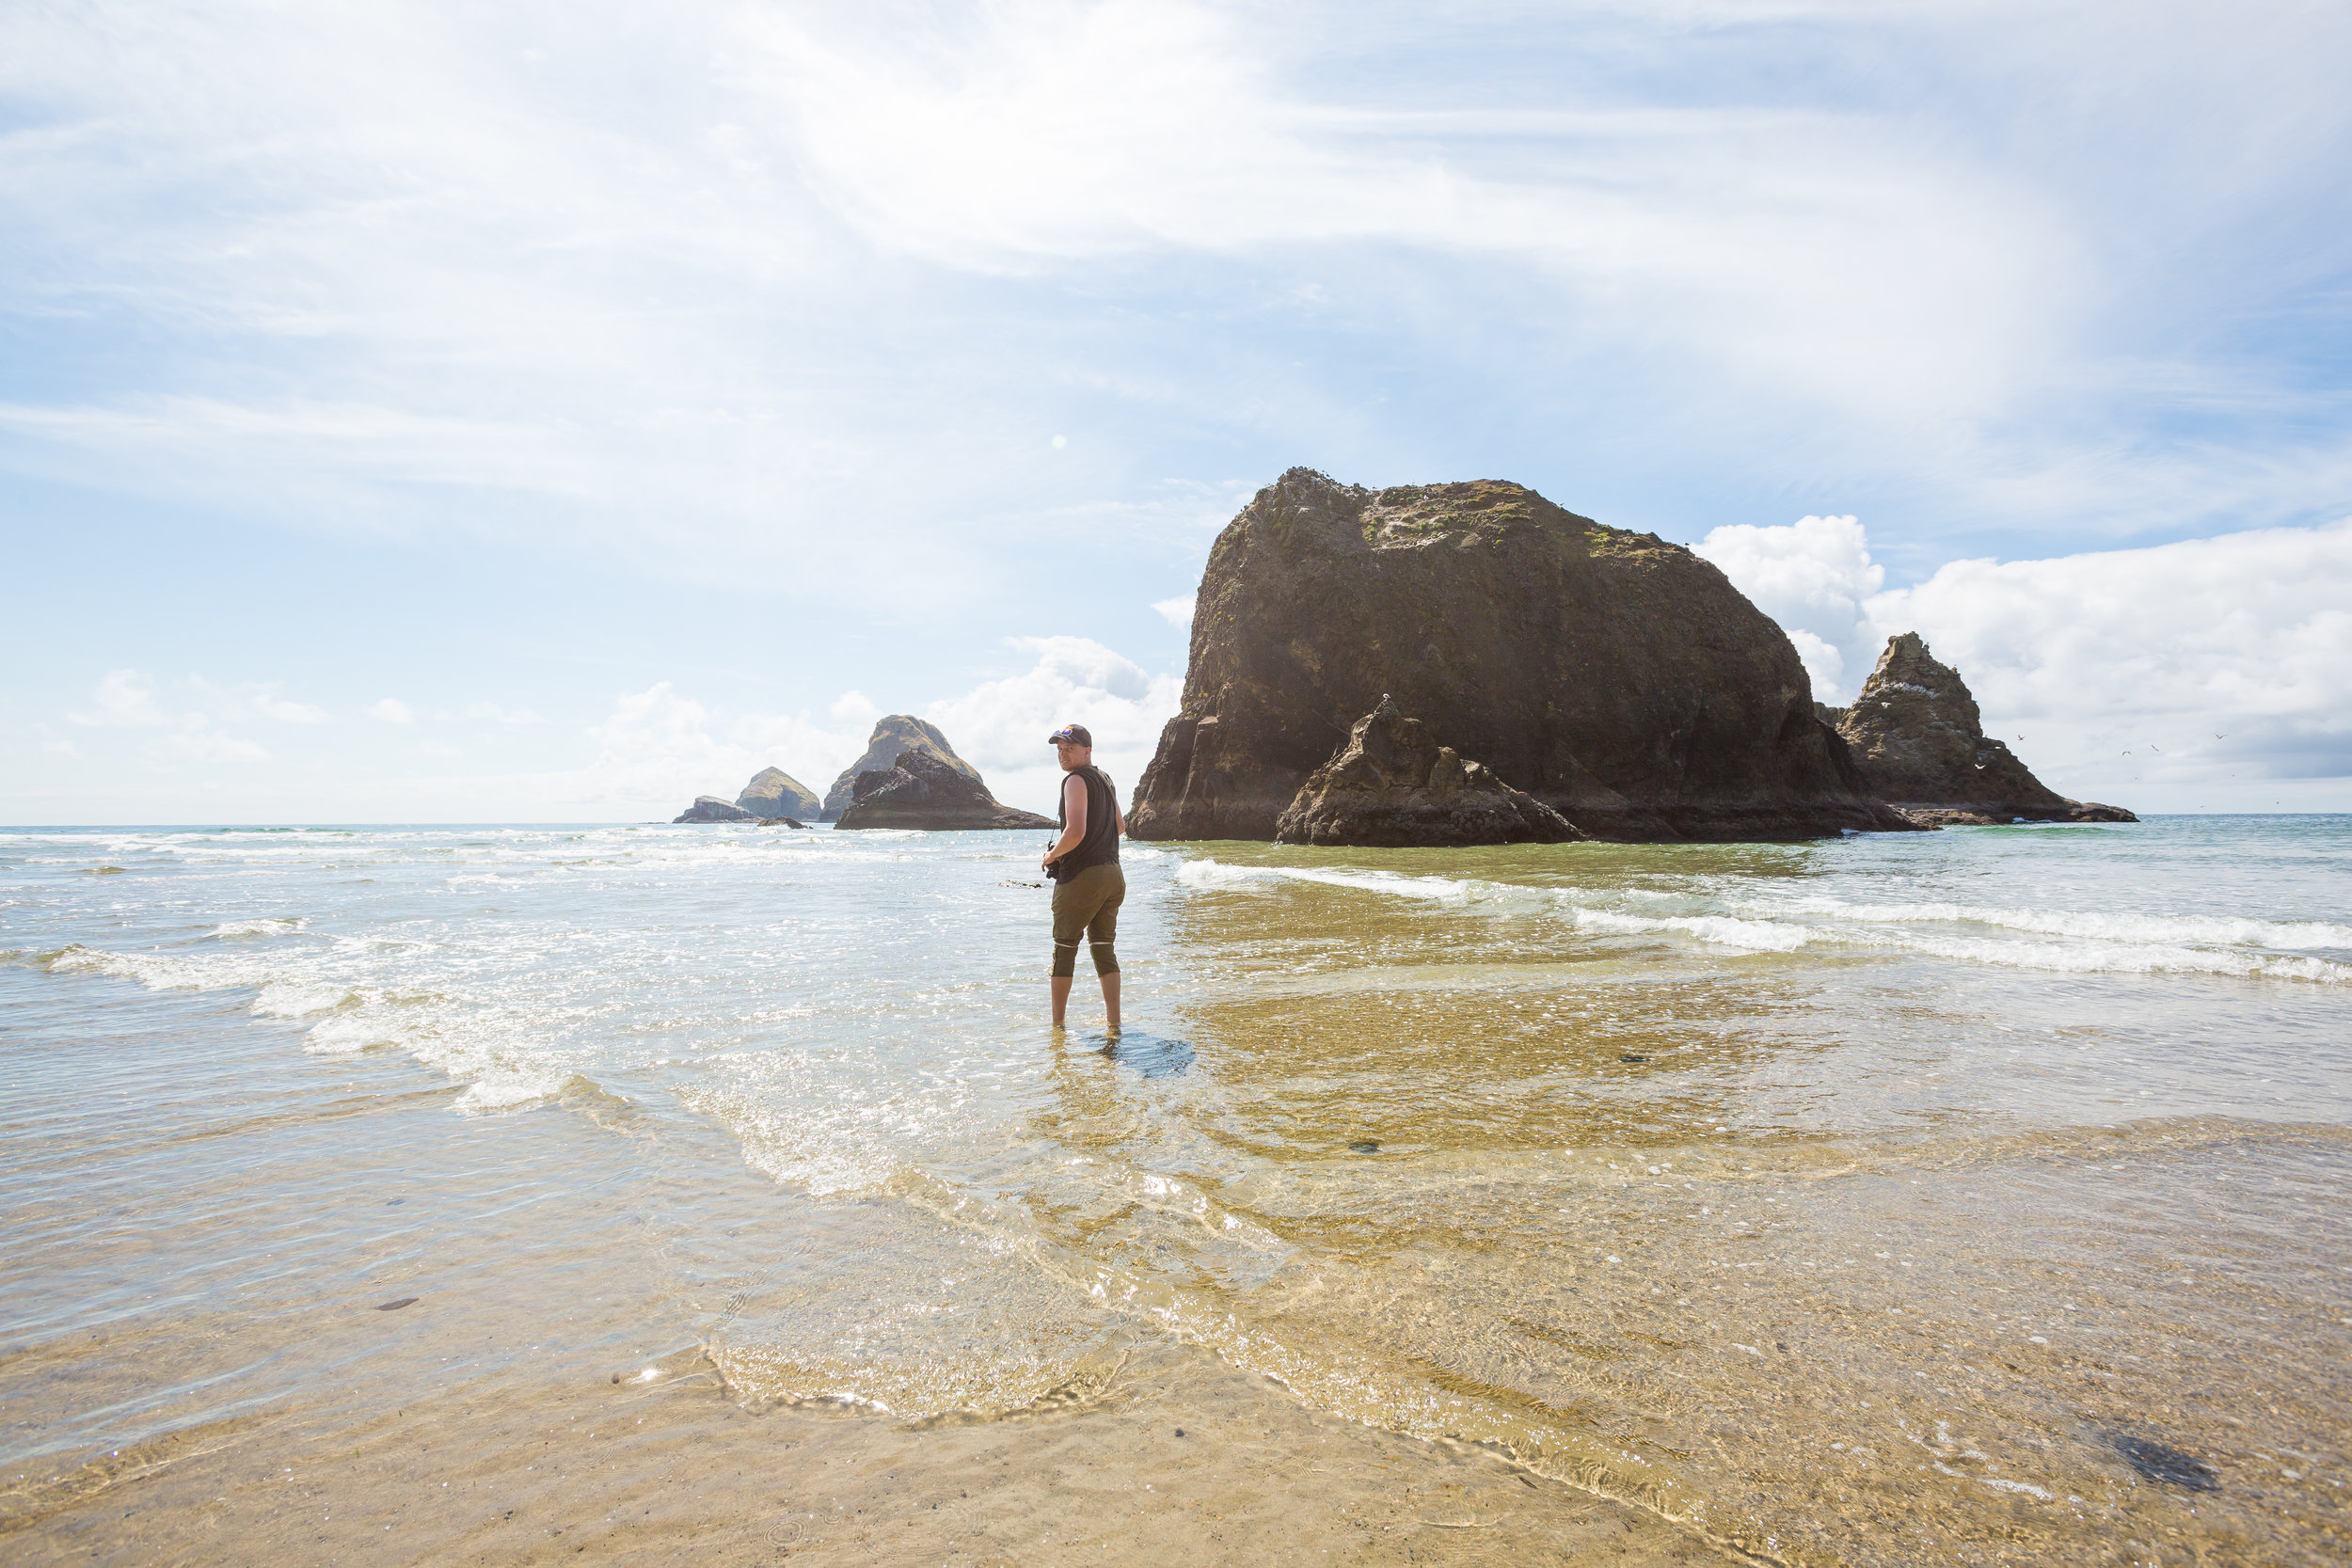 nicole-daacke-photography-oregon-coast-landscapes-elopement-photographer-wedding-photography-adventure-lifestyle-roadtrip-along-oregon-coast-cape-kiwanda-oceanside-beach-cannon-beach-oregon-pnw-14.jpg